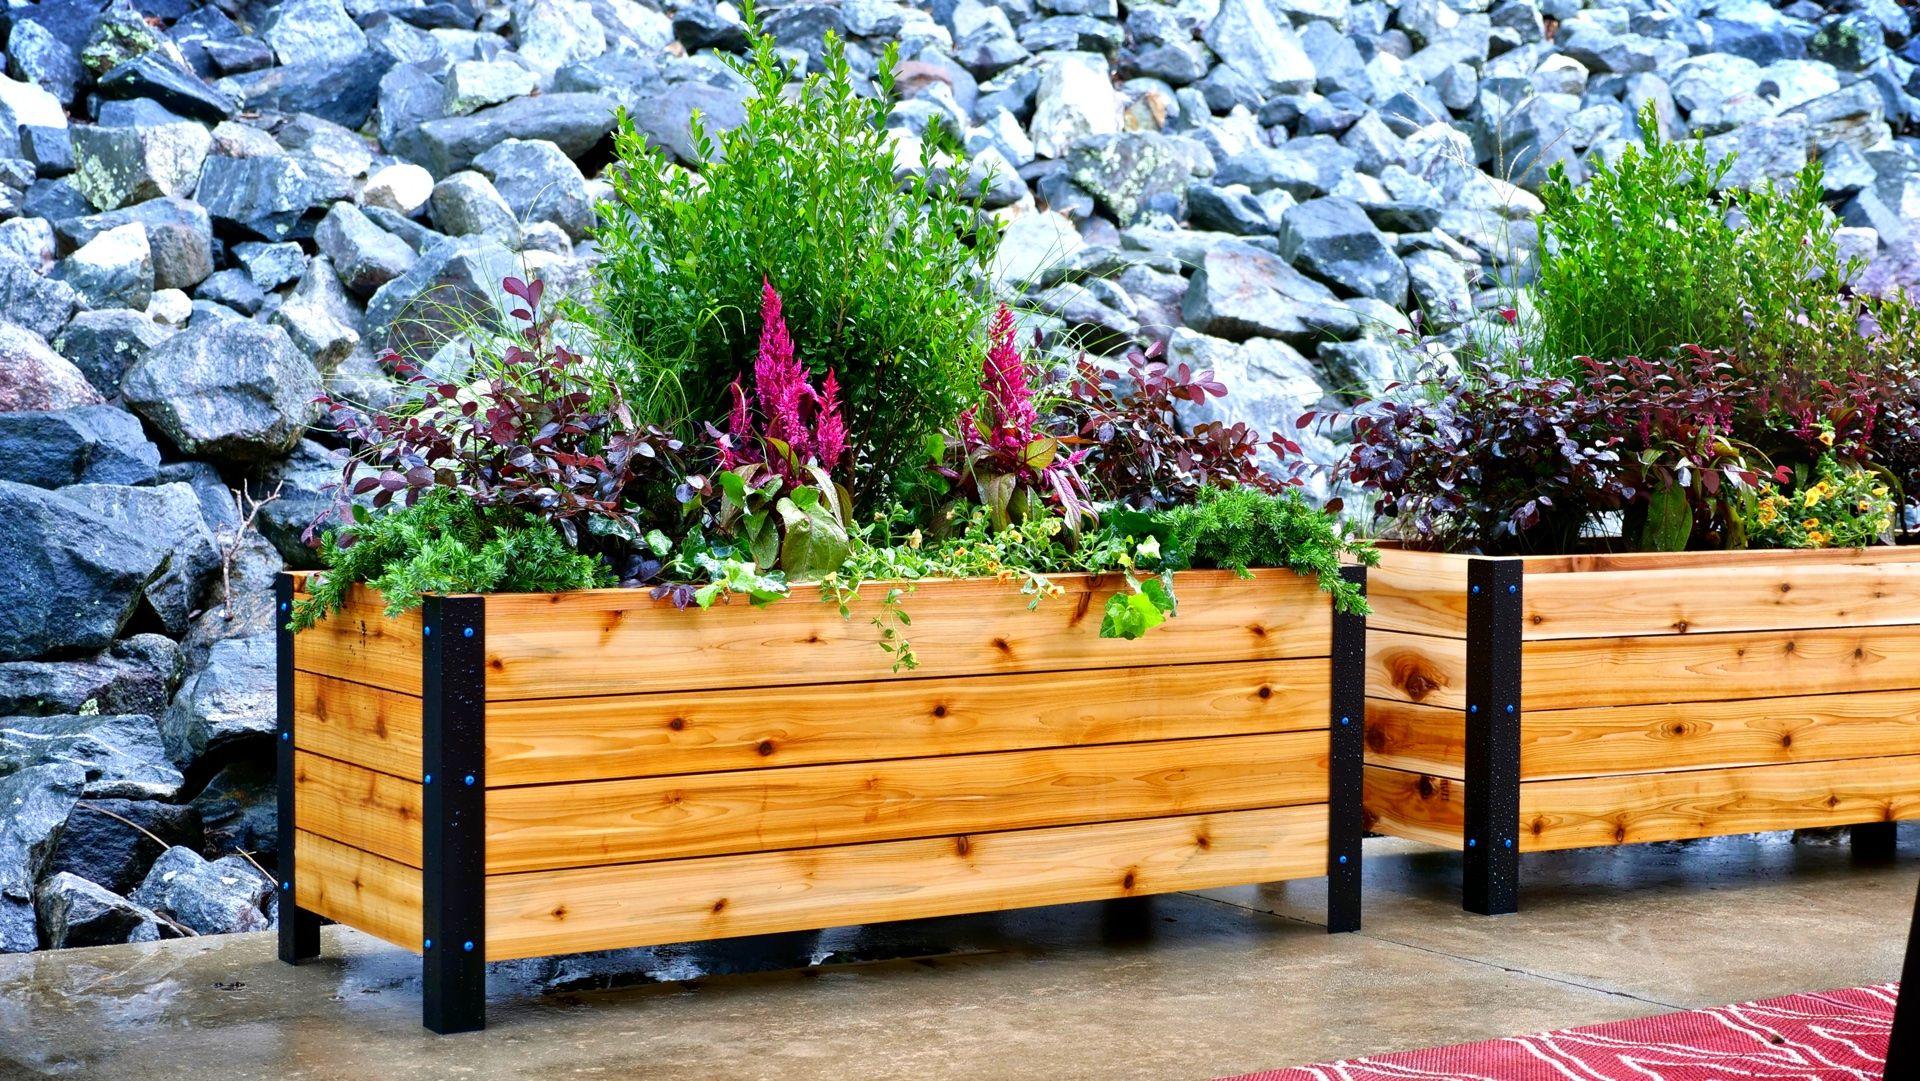 How To Build A Diy Modern Raised Planter Box Raised 400 x 300